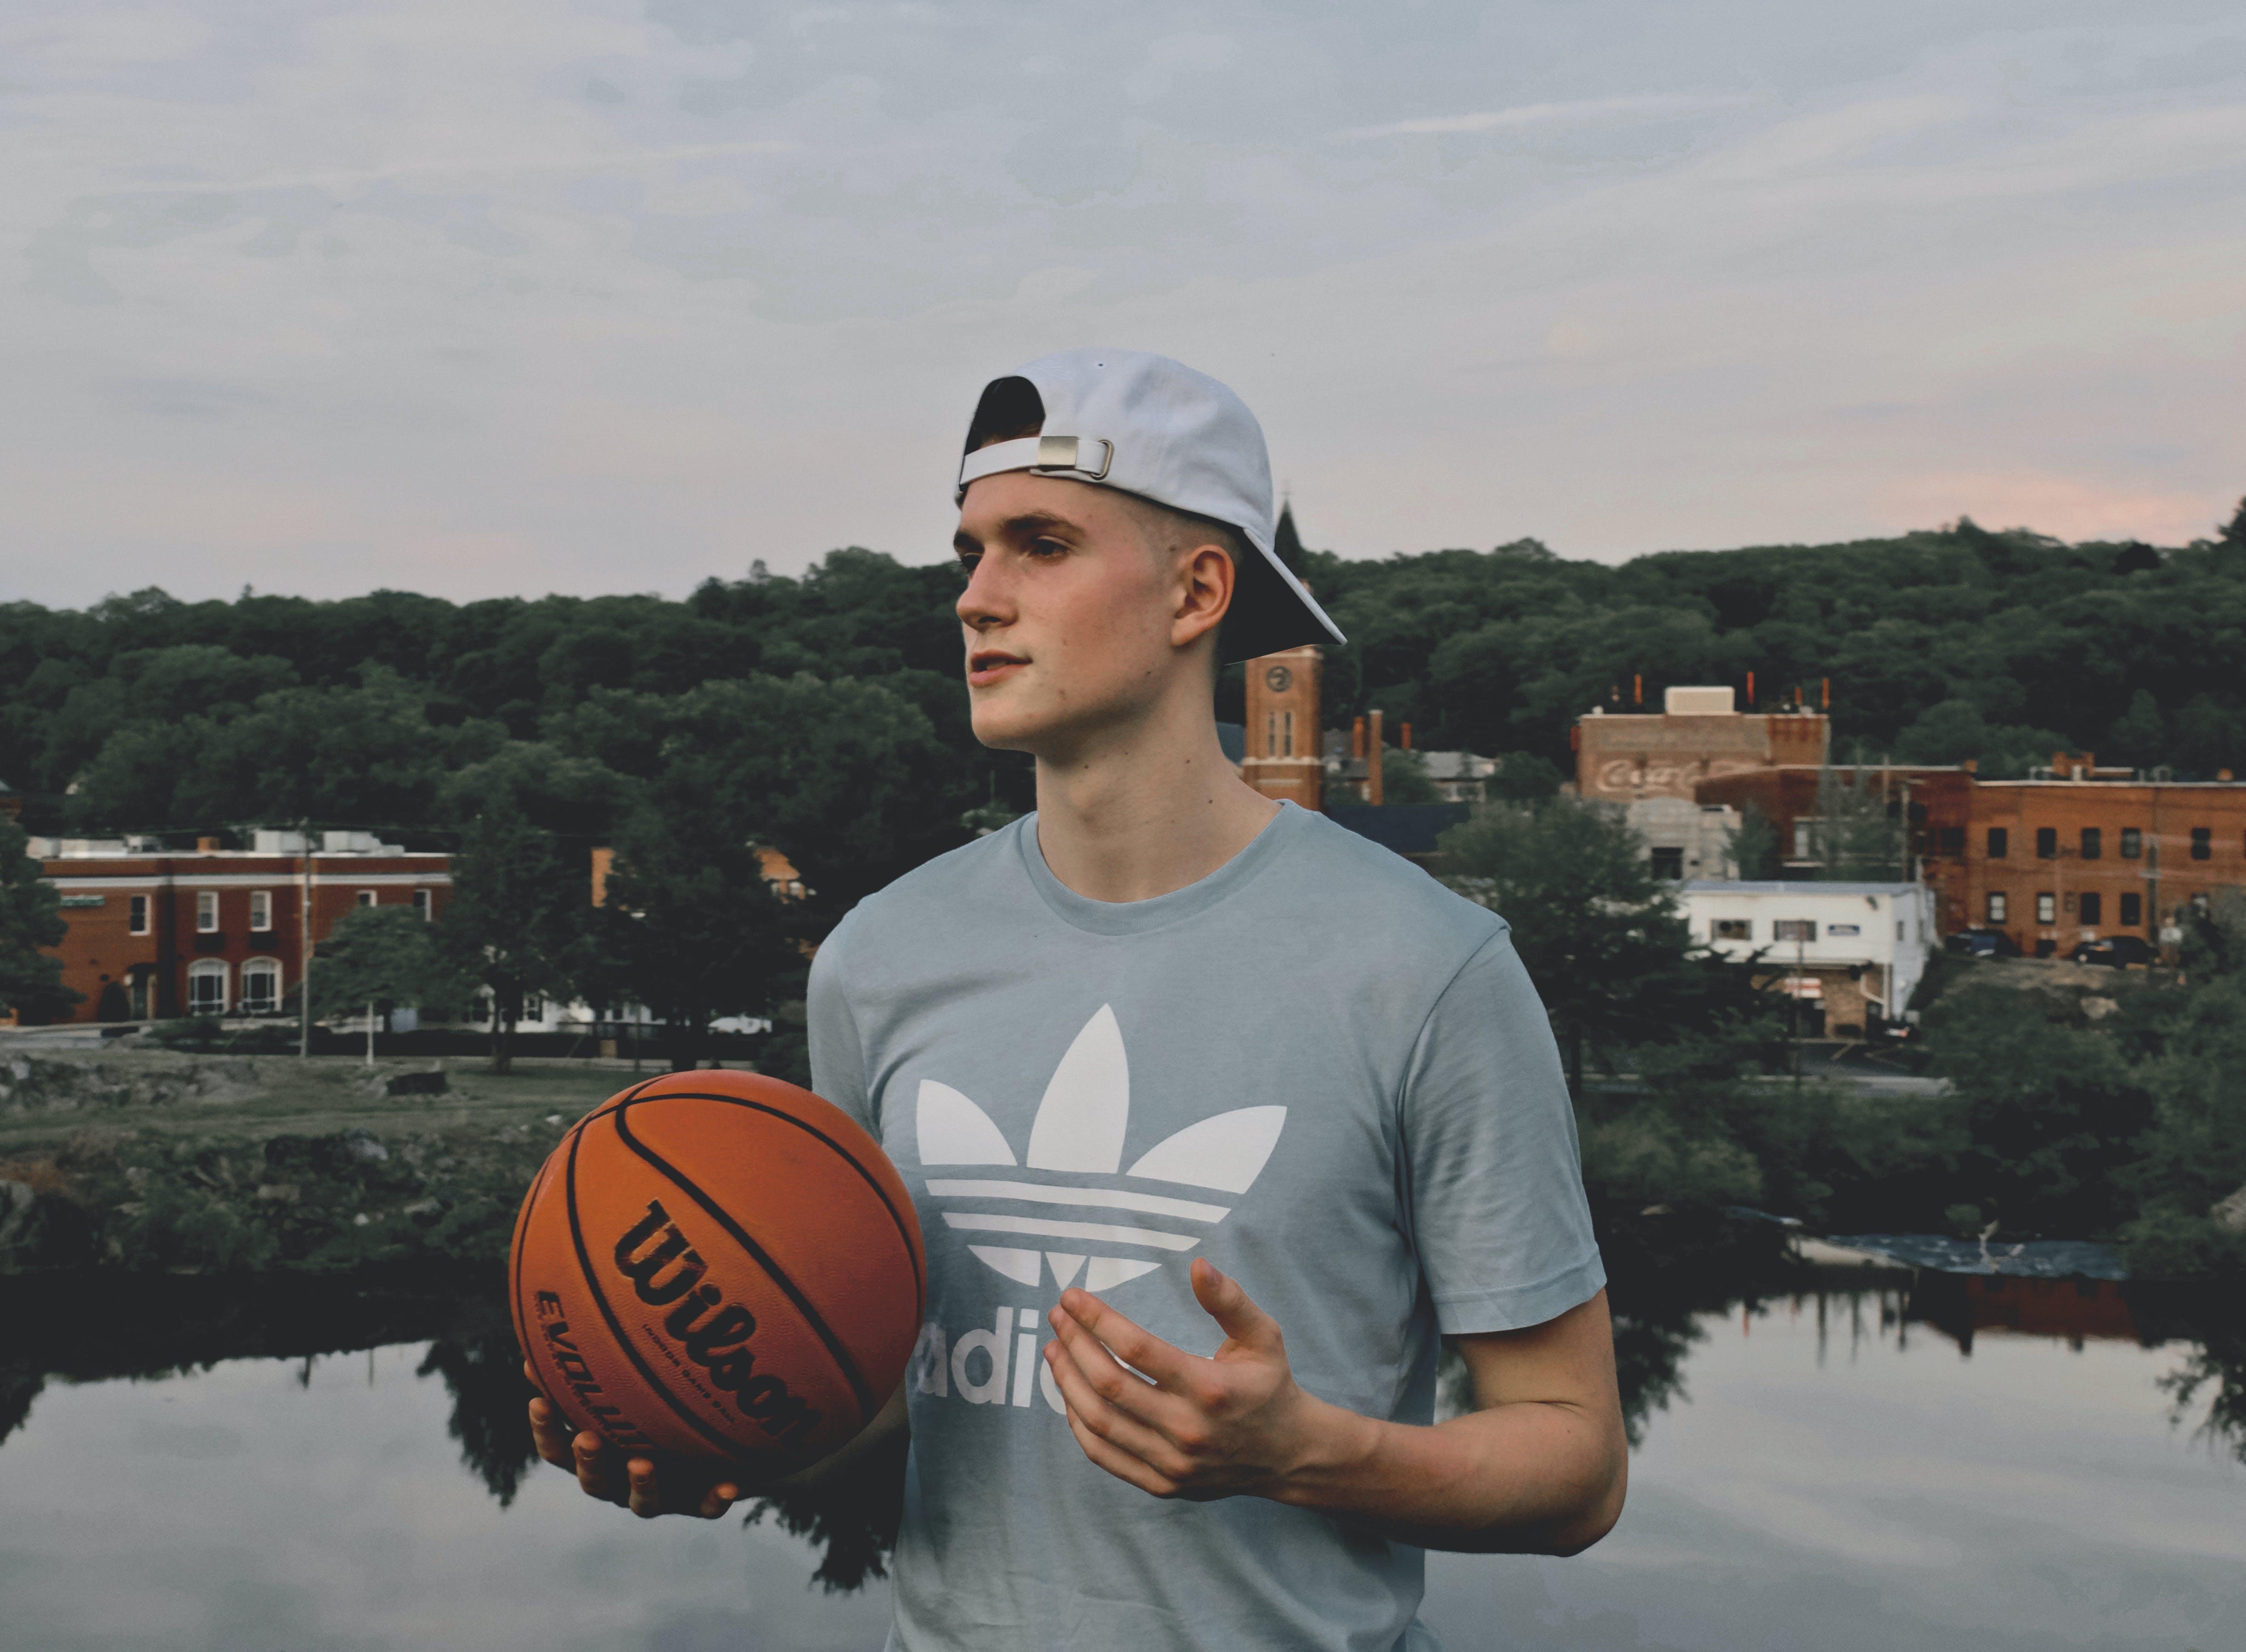 Man Wearing Gray Crew Neck Shirt Holding Basketball